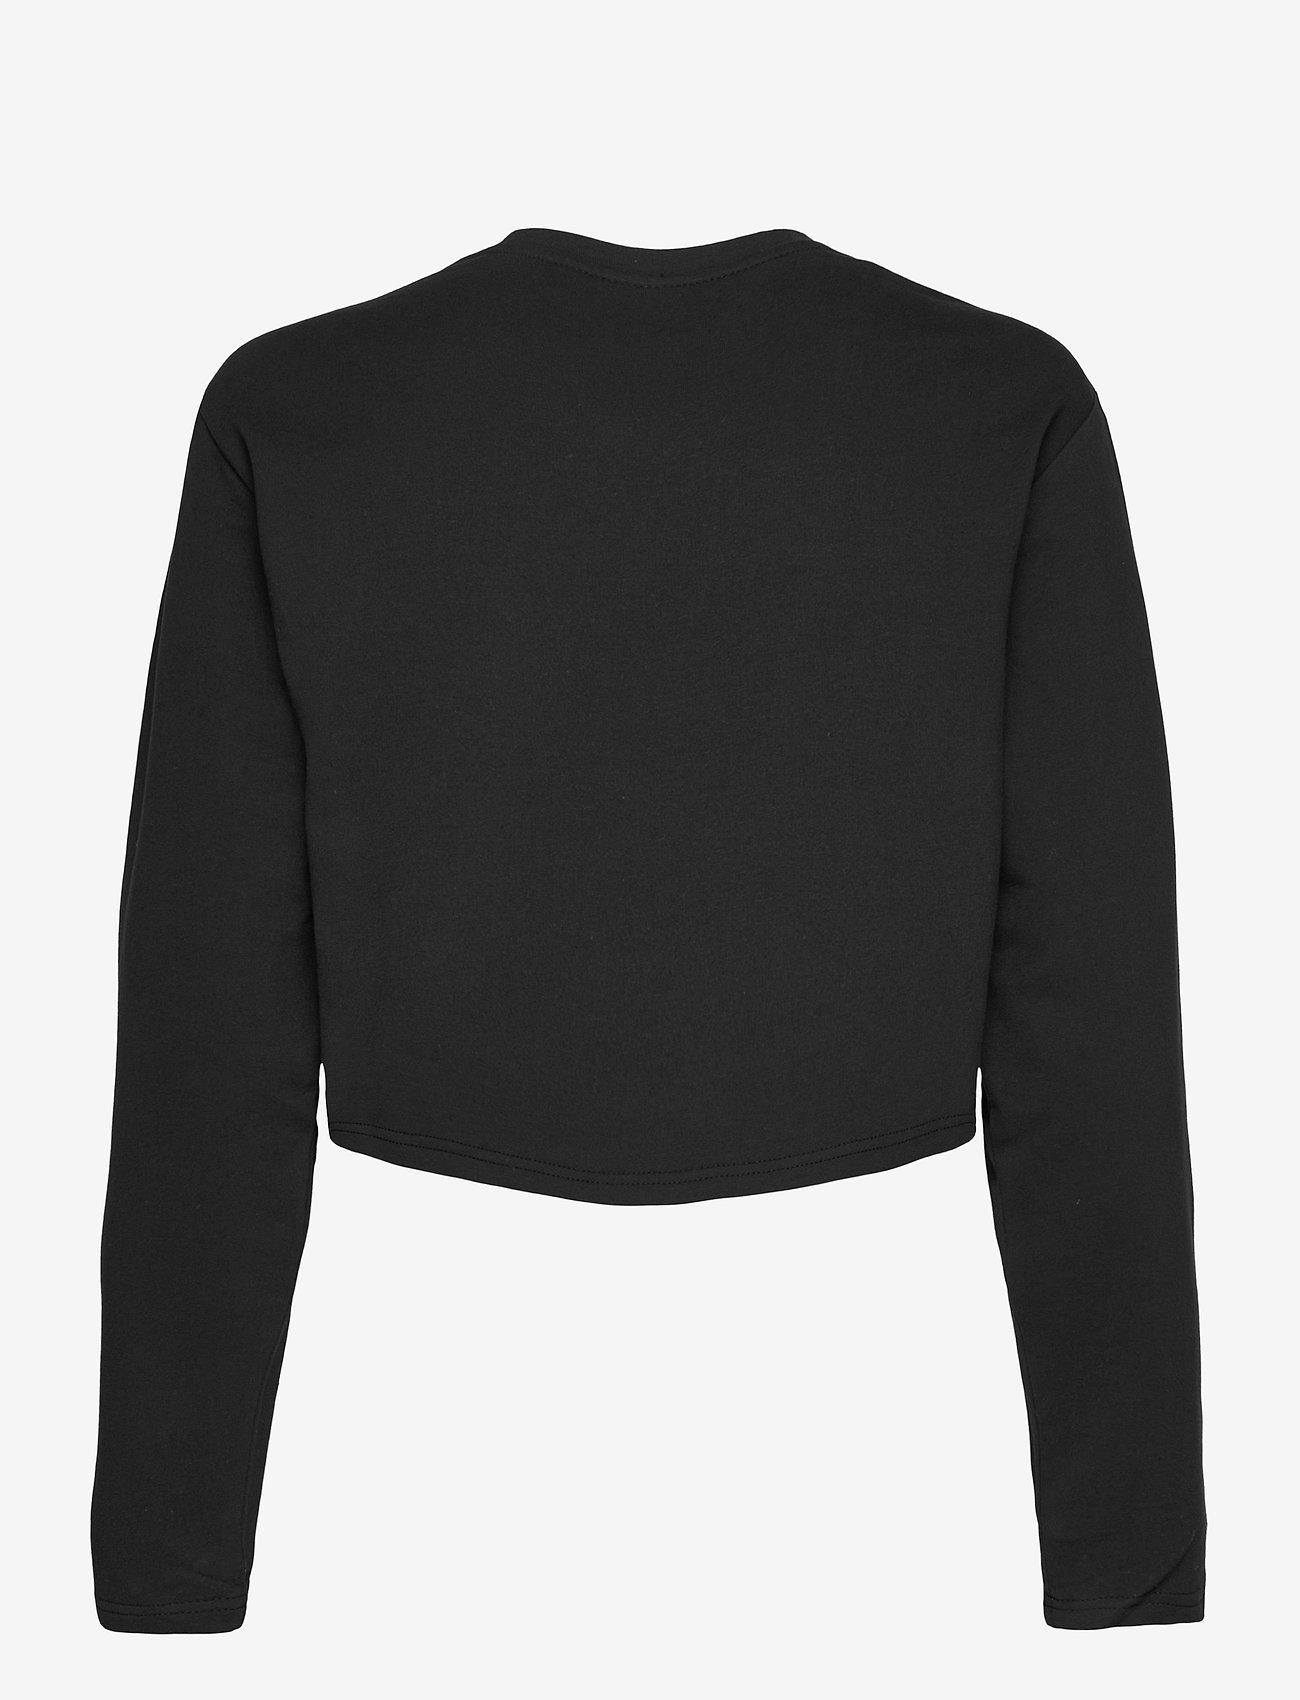 VANS - RAMP TESTED CREW - navel shirts - black - 1